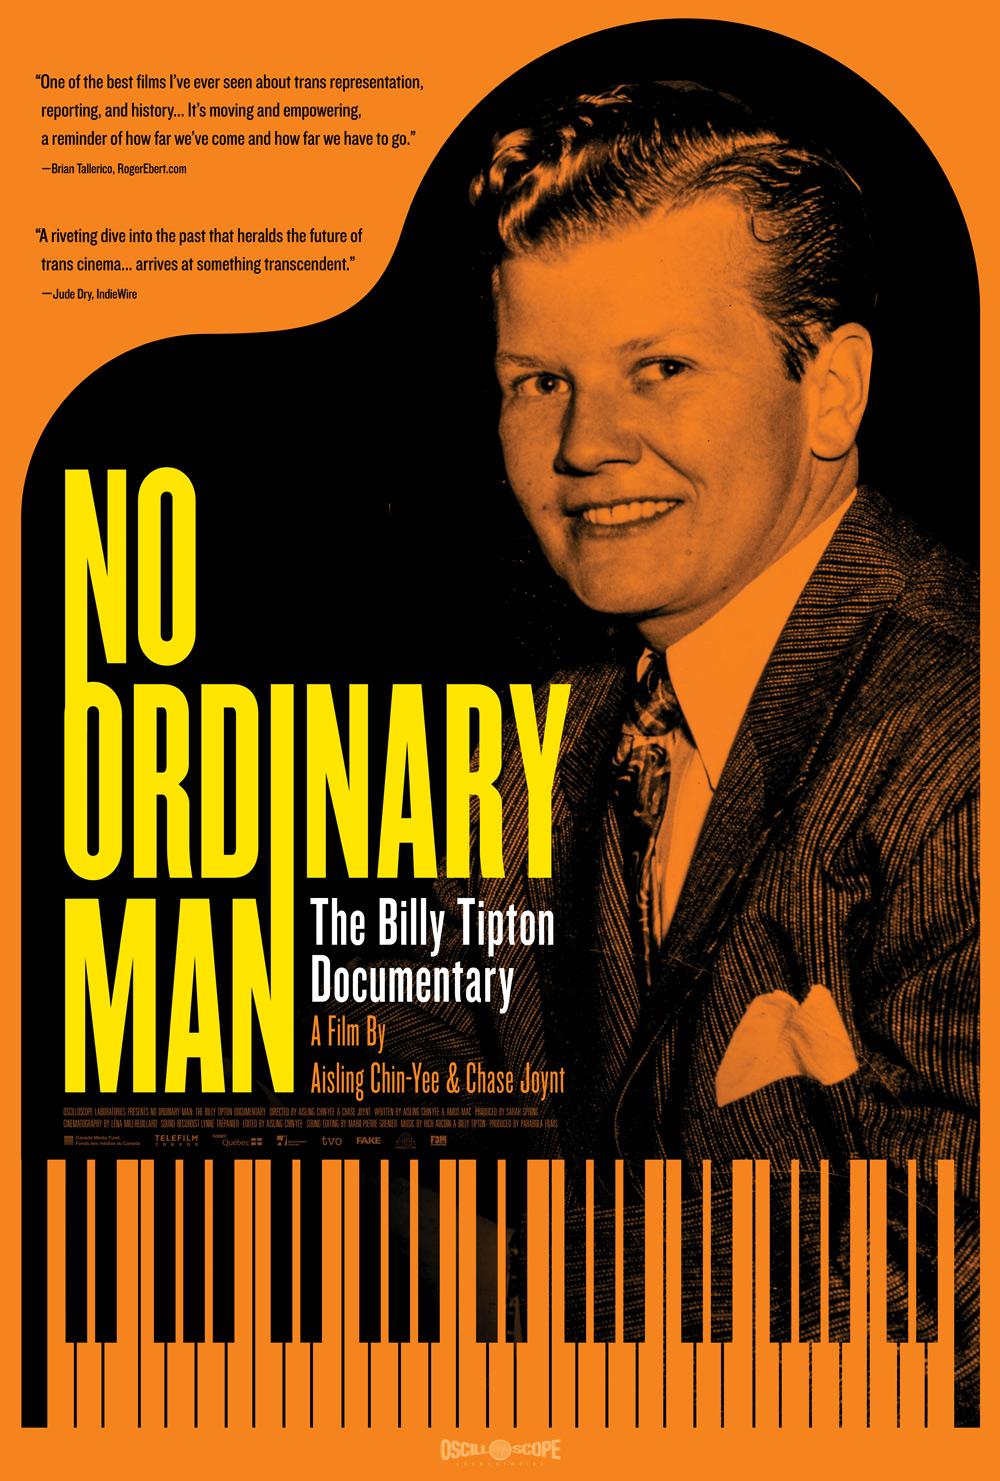 No Ordinary Man Doc Poster